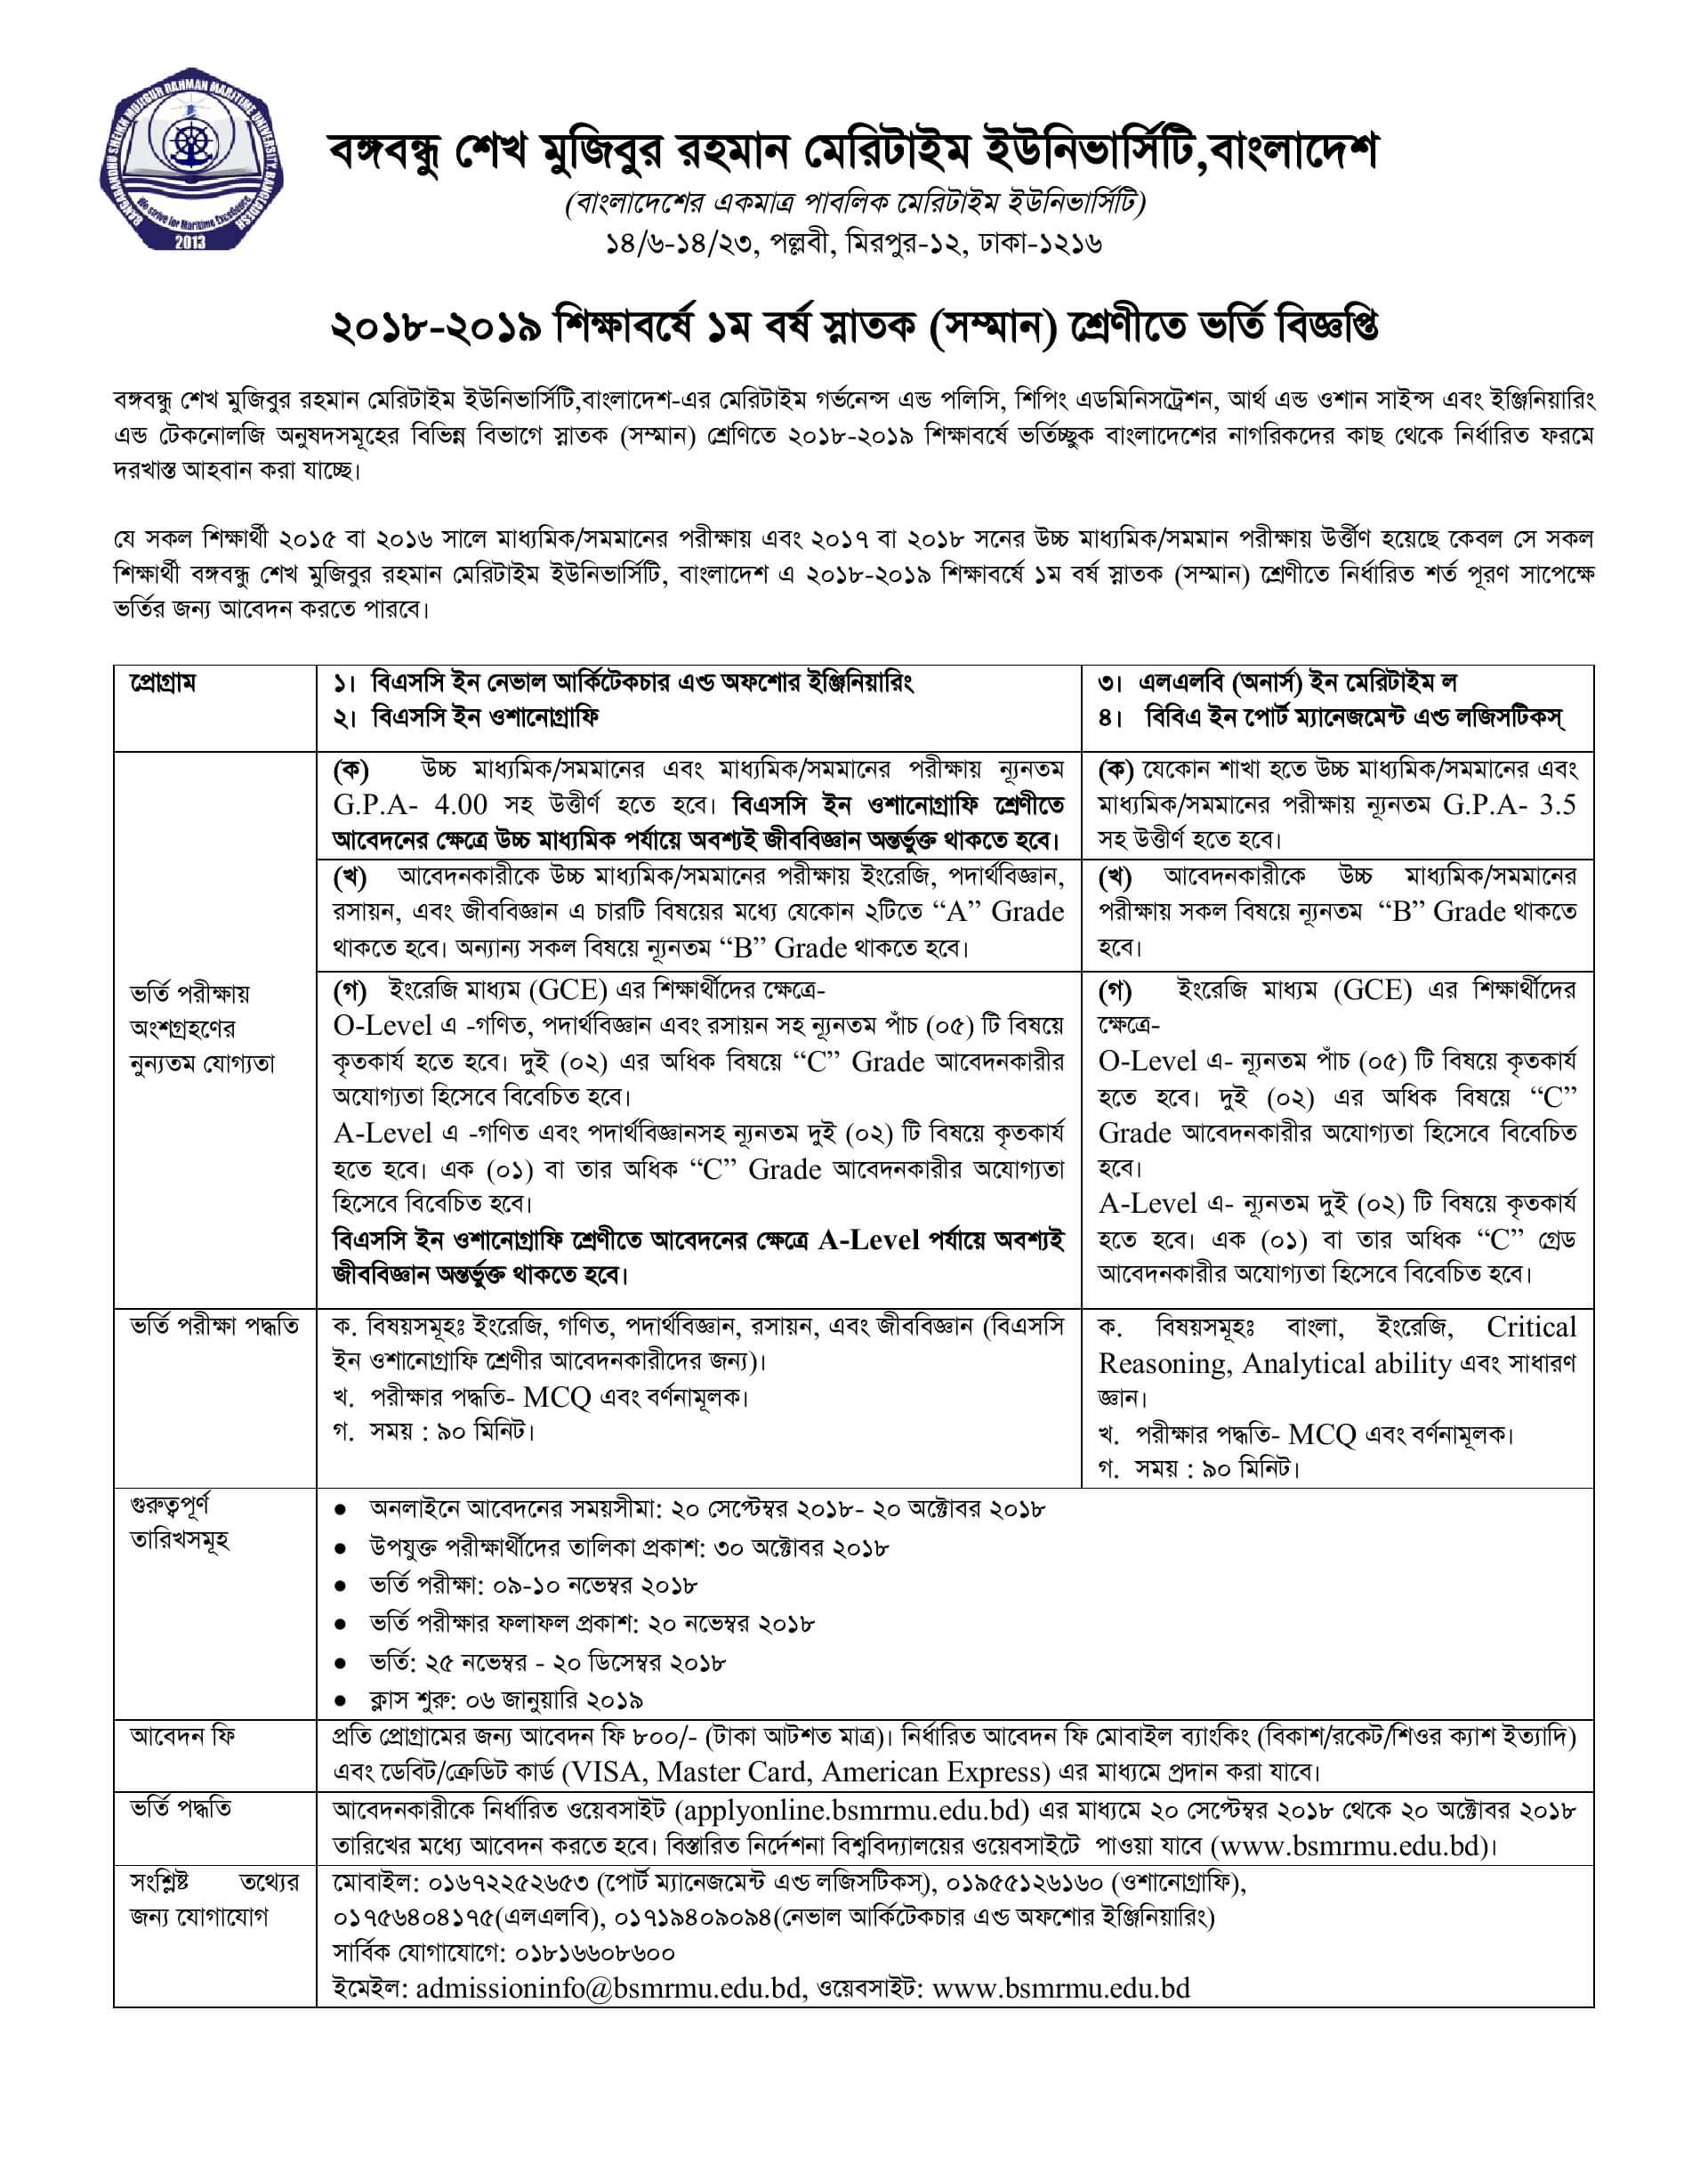 Bangabandhu Sheikh Mujibur Rahman maritime university Admission Circular